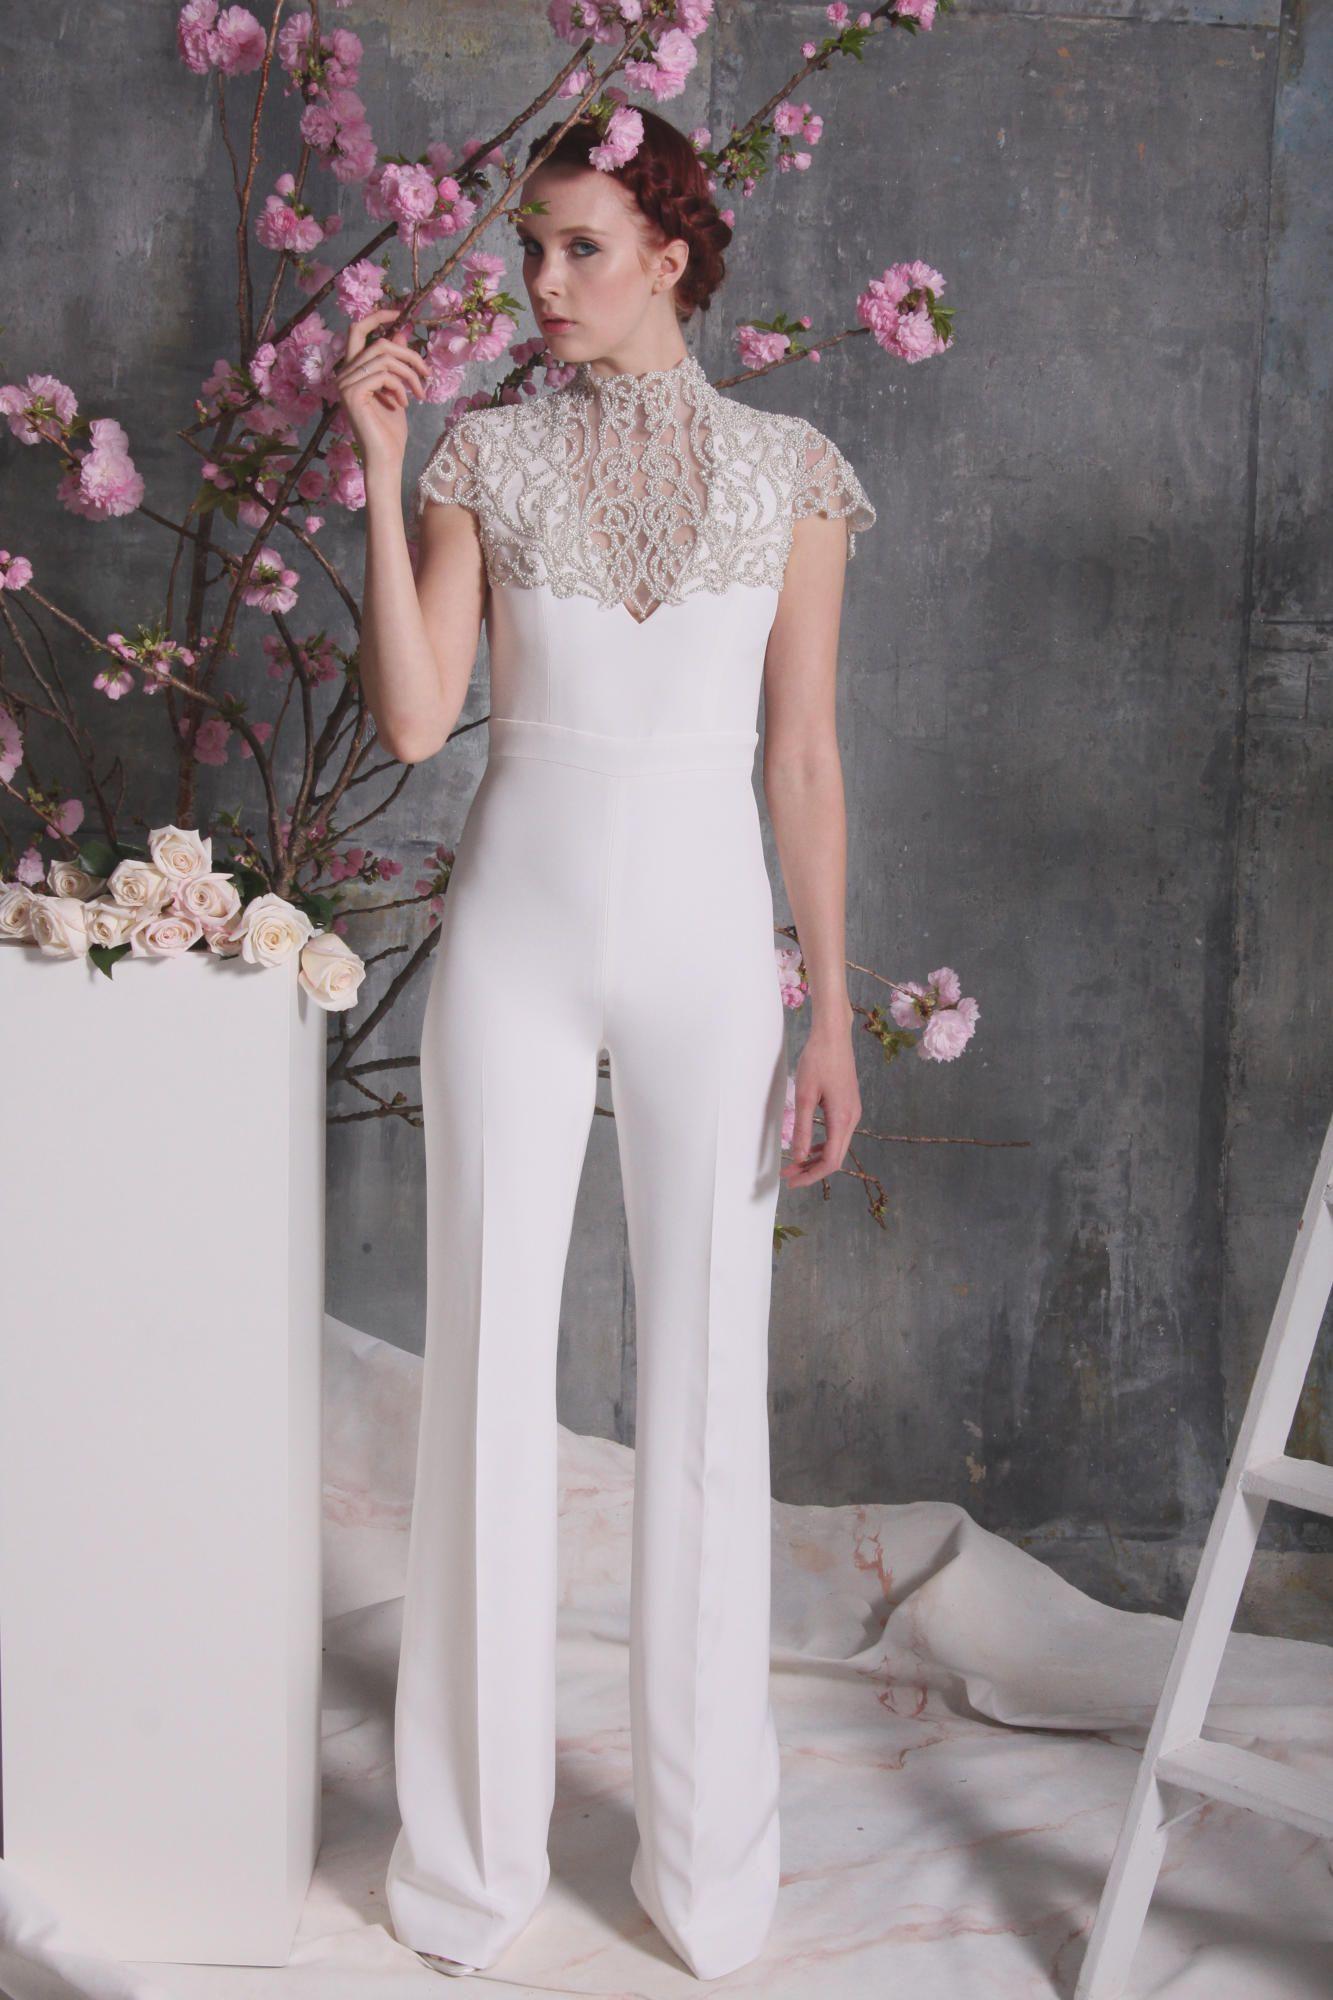 christian-siriano-bridal-spring-2018-jumpsuit Tendências de vestidos de noiva para 2018